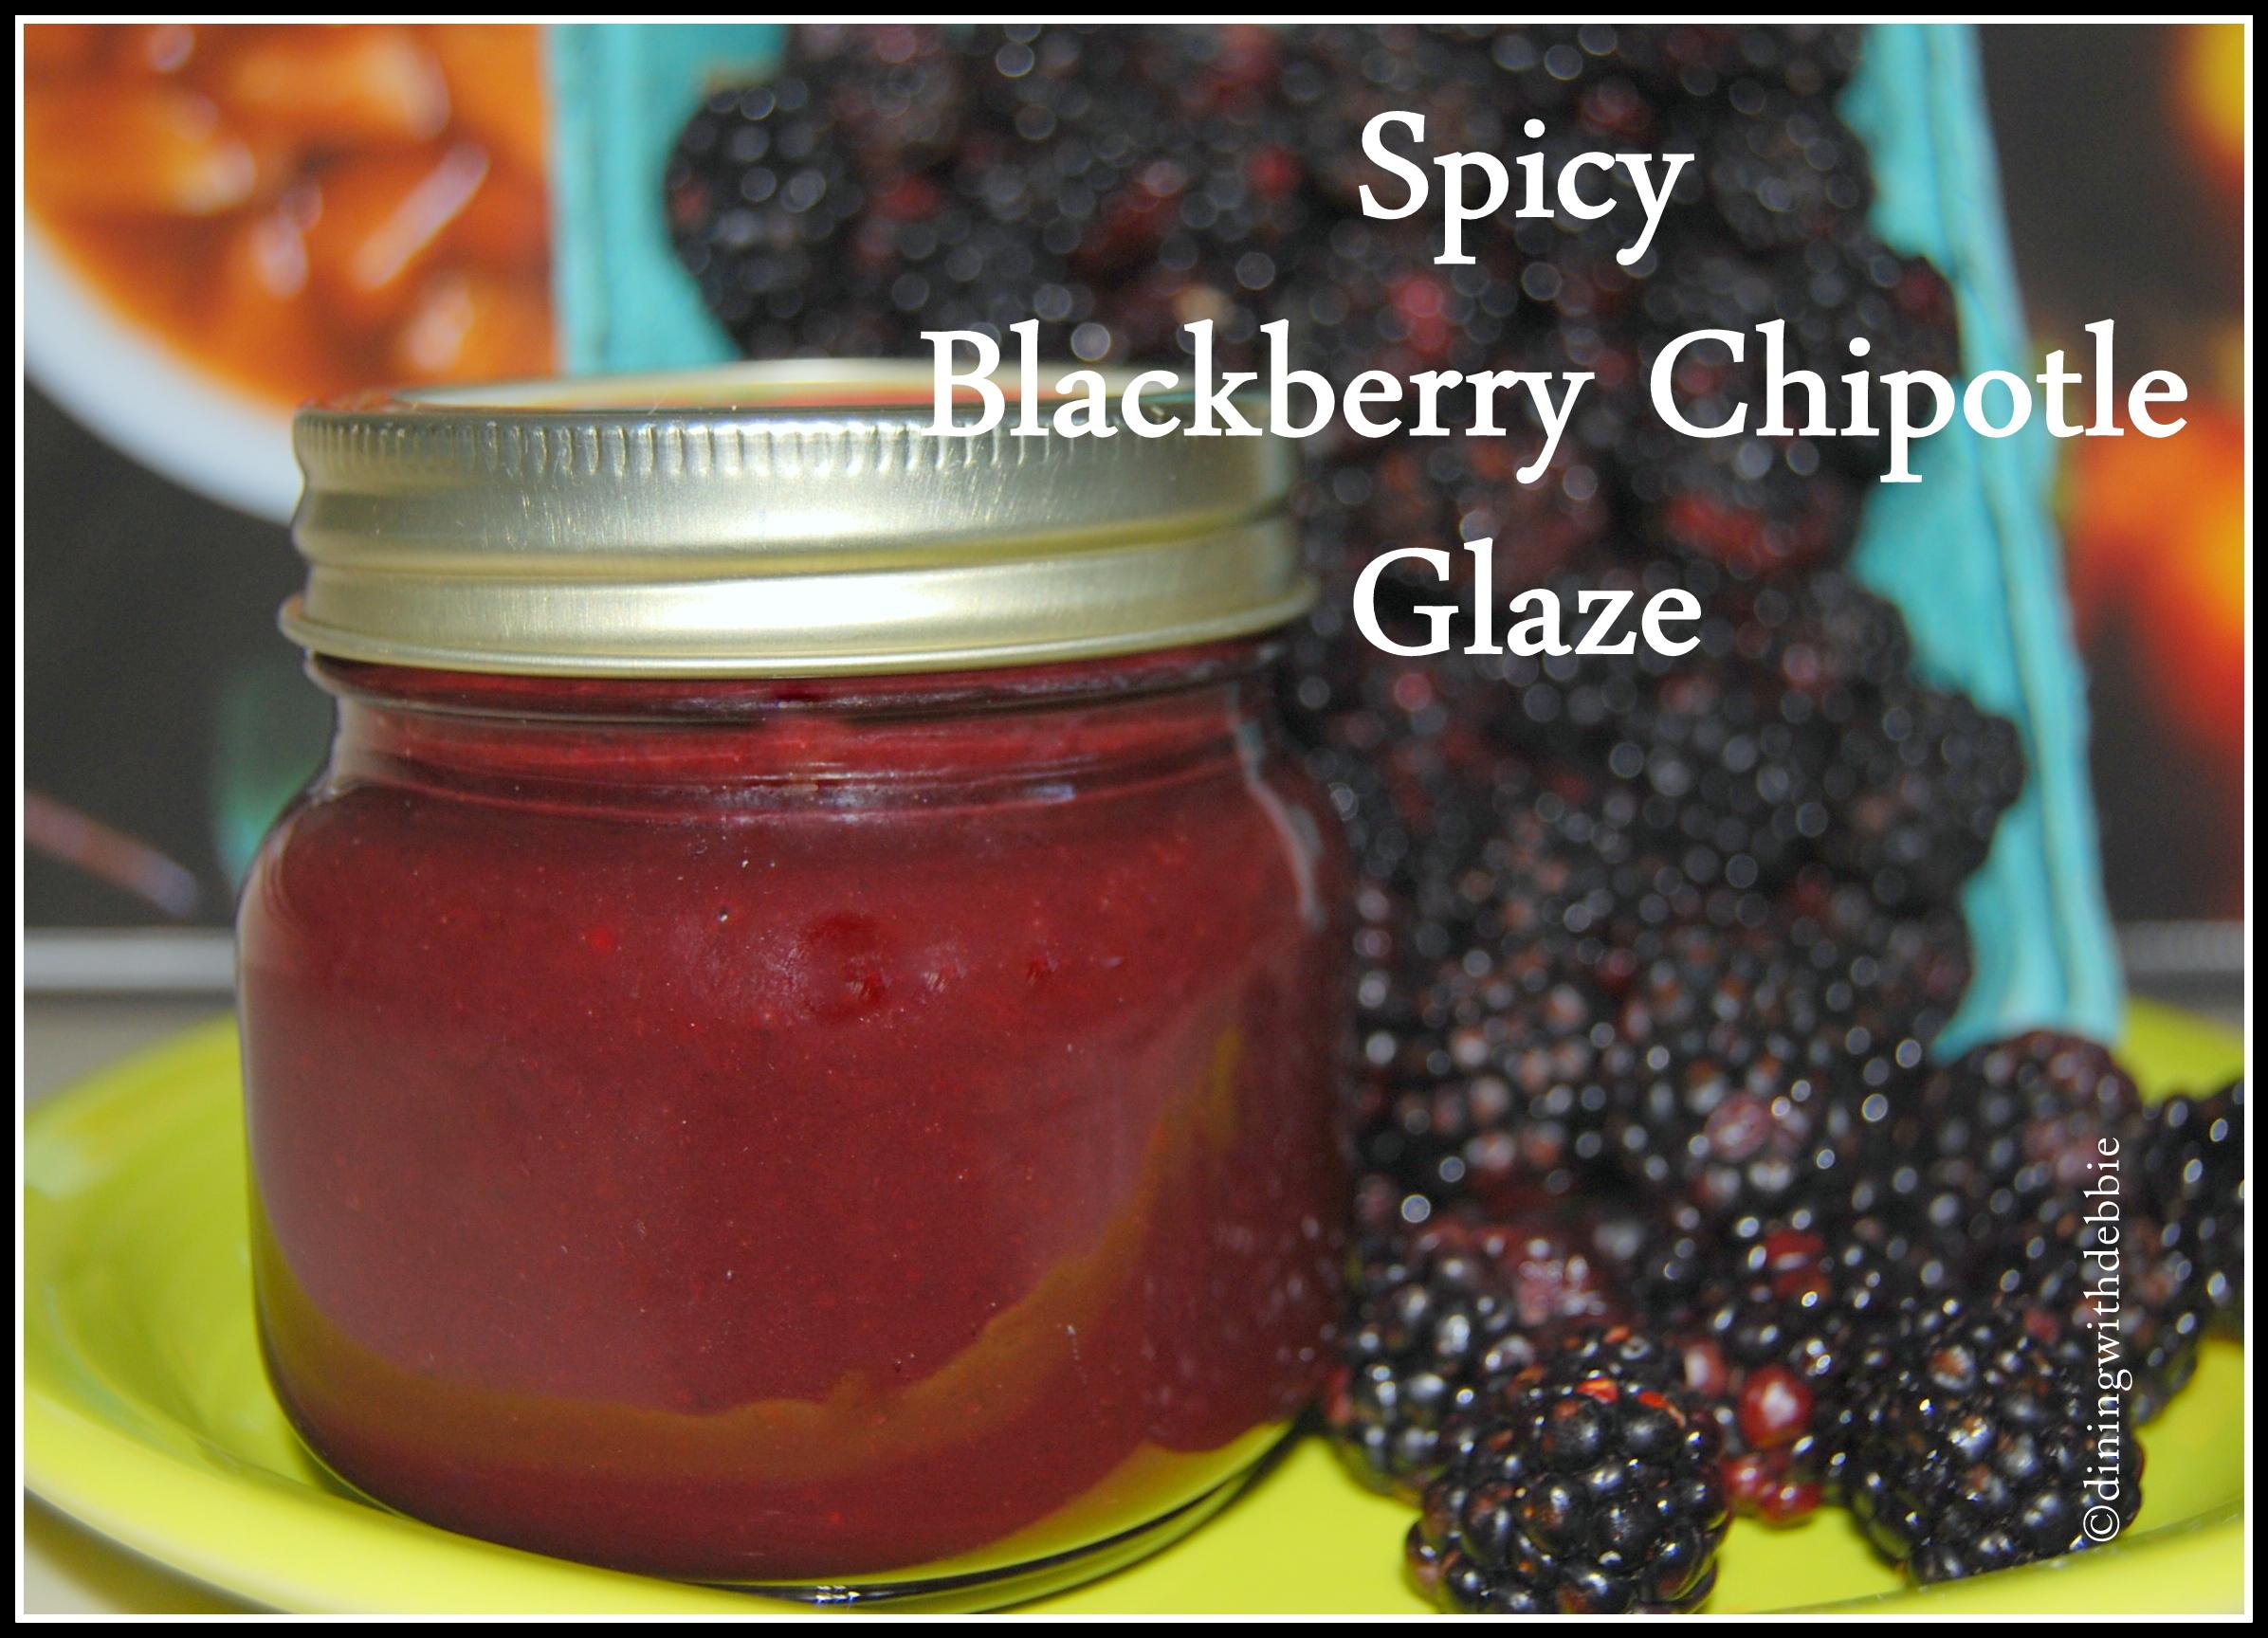 #Virtual #Smokeoff–Spicy Blackberry Chipotle Glaze